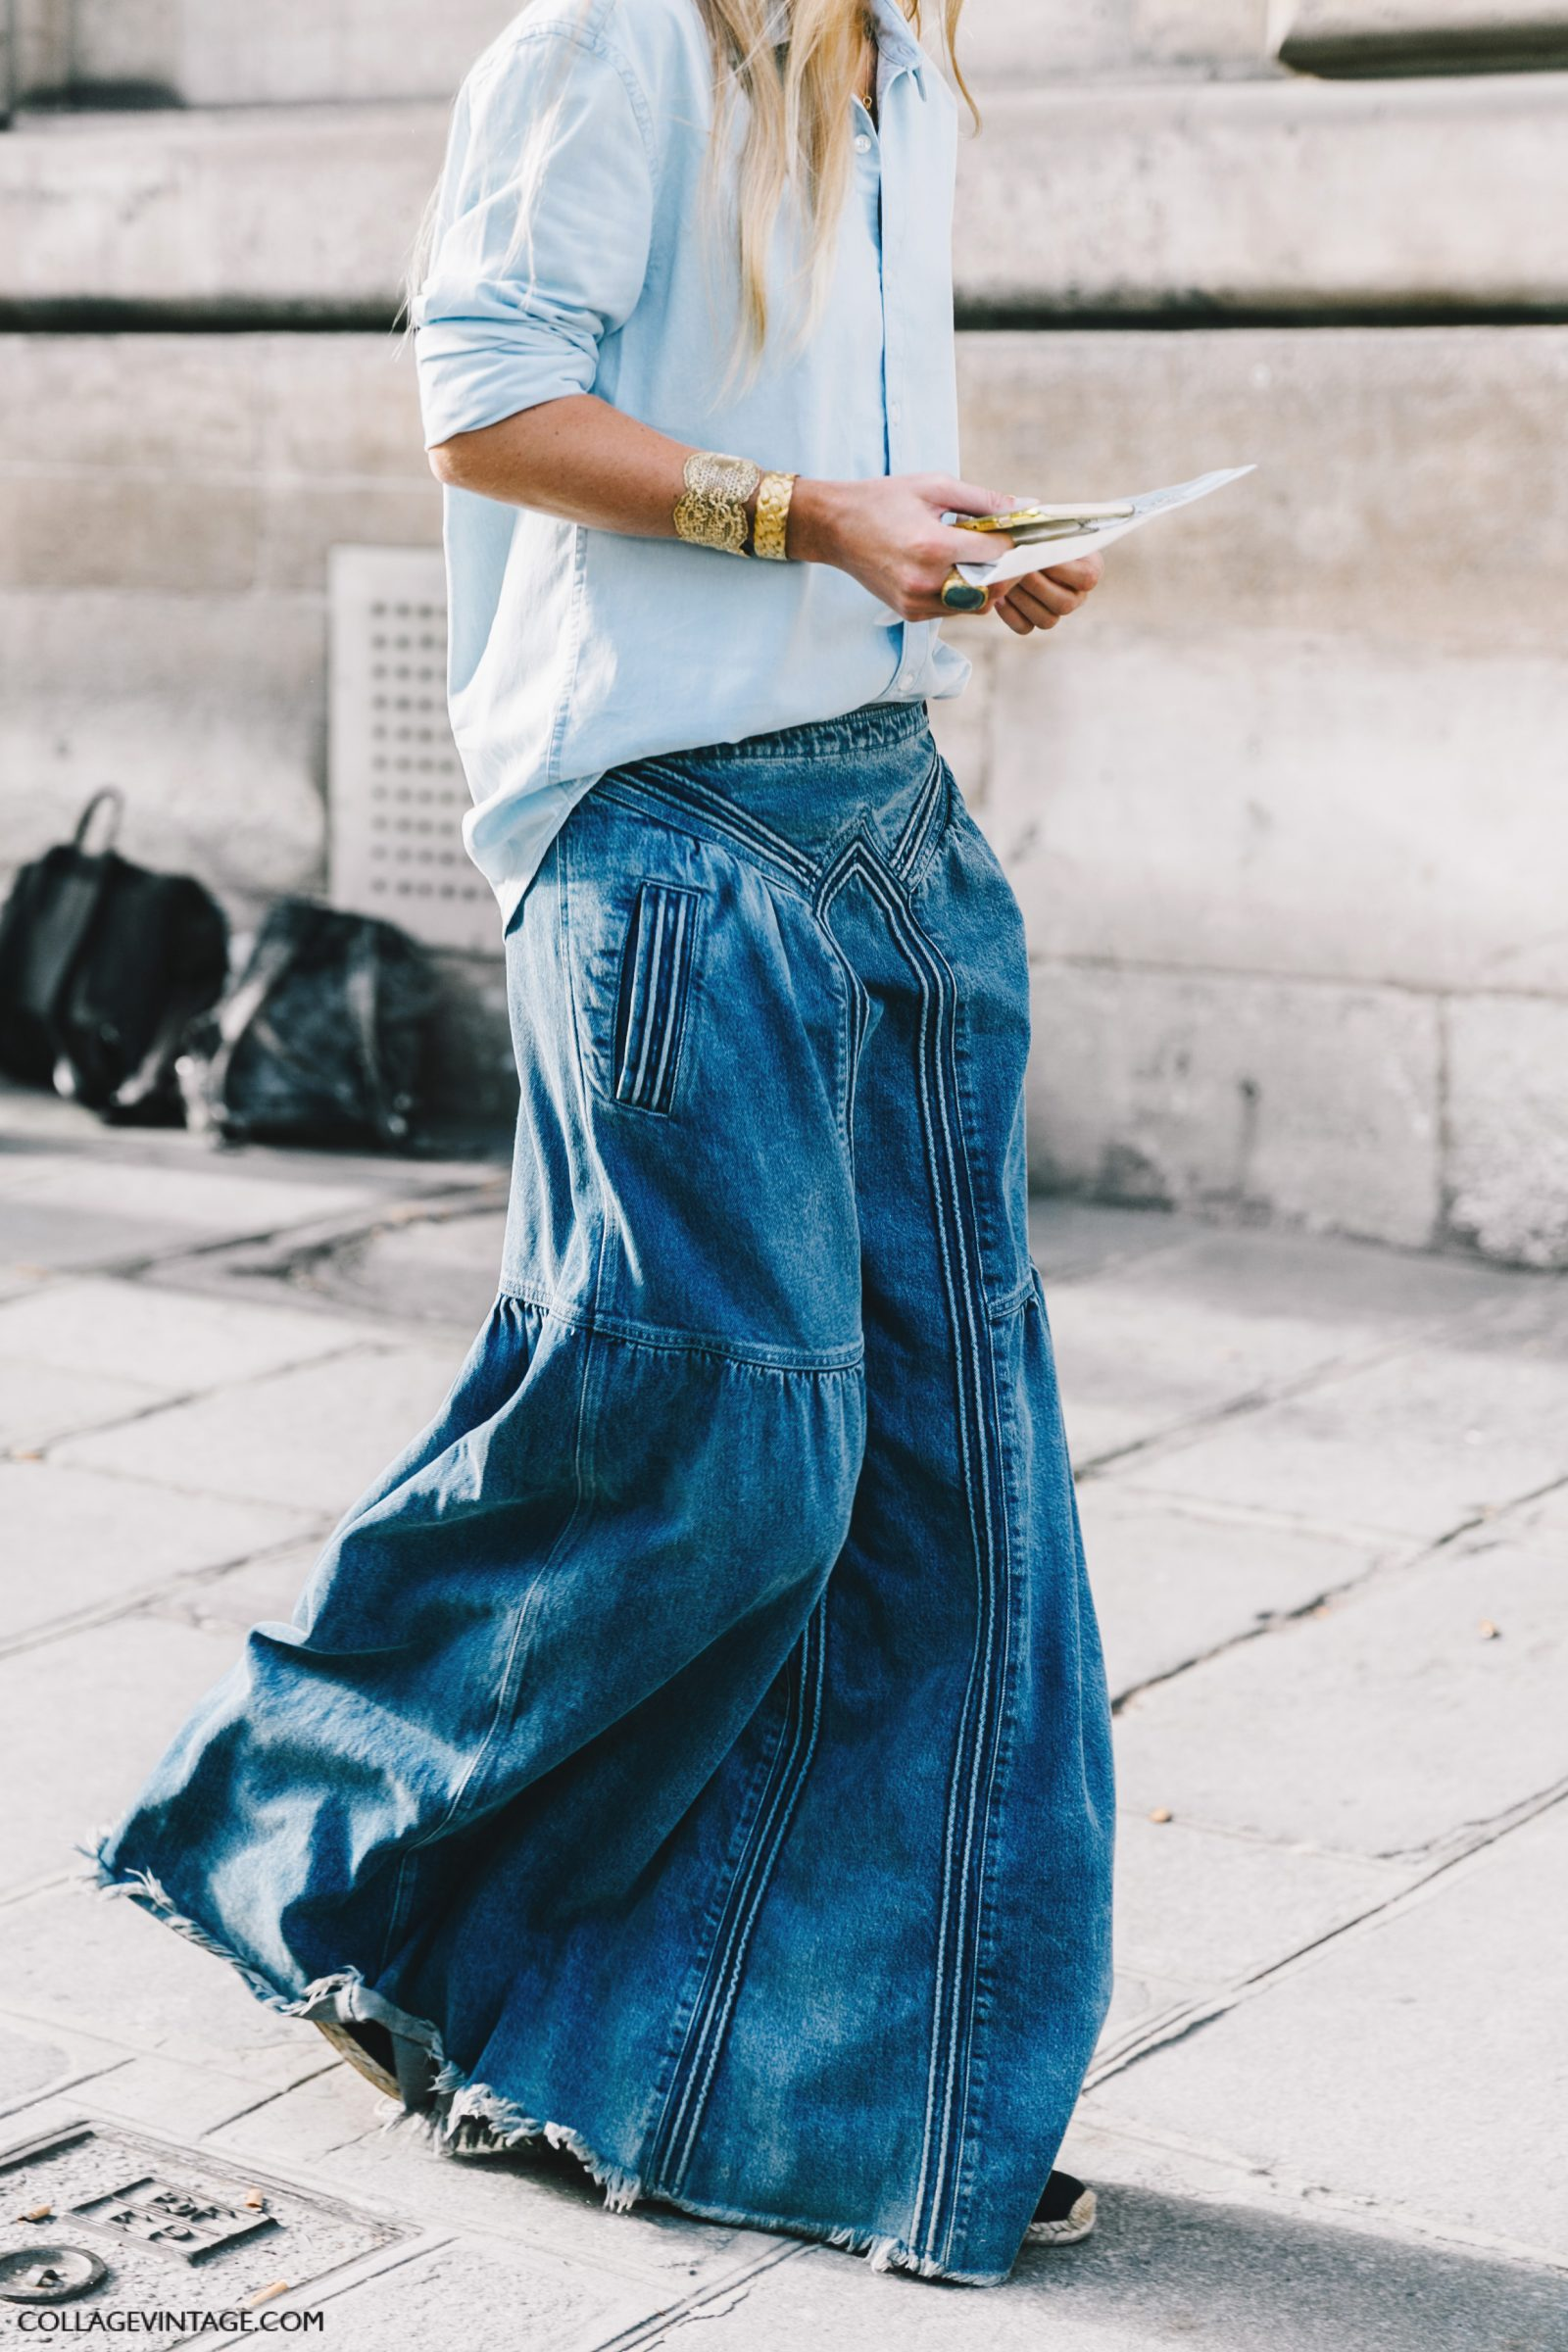 pfw-paris_fashion_week_ss17-street_style-outfits-collage_vintage-rochas-courreges-dries_van_noten-lanvin-guy_laroche-19